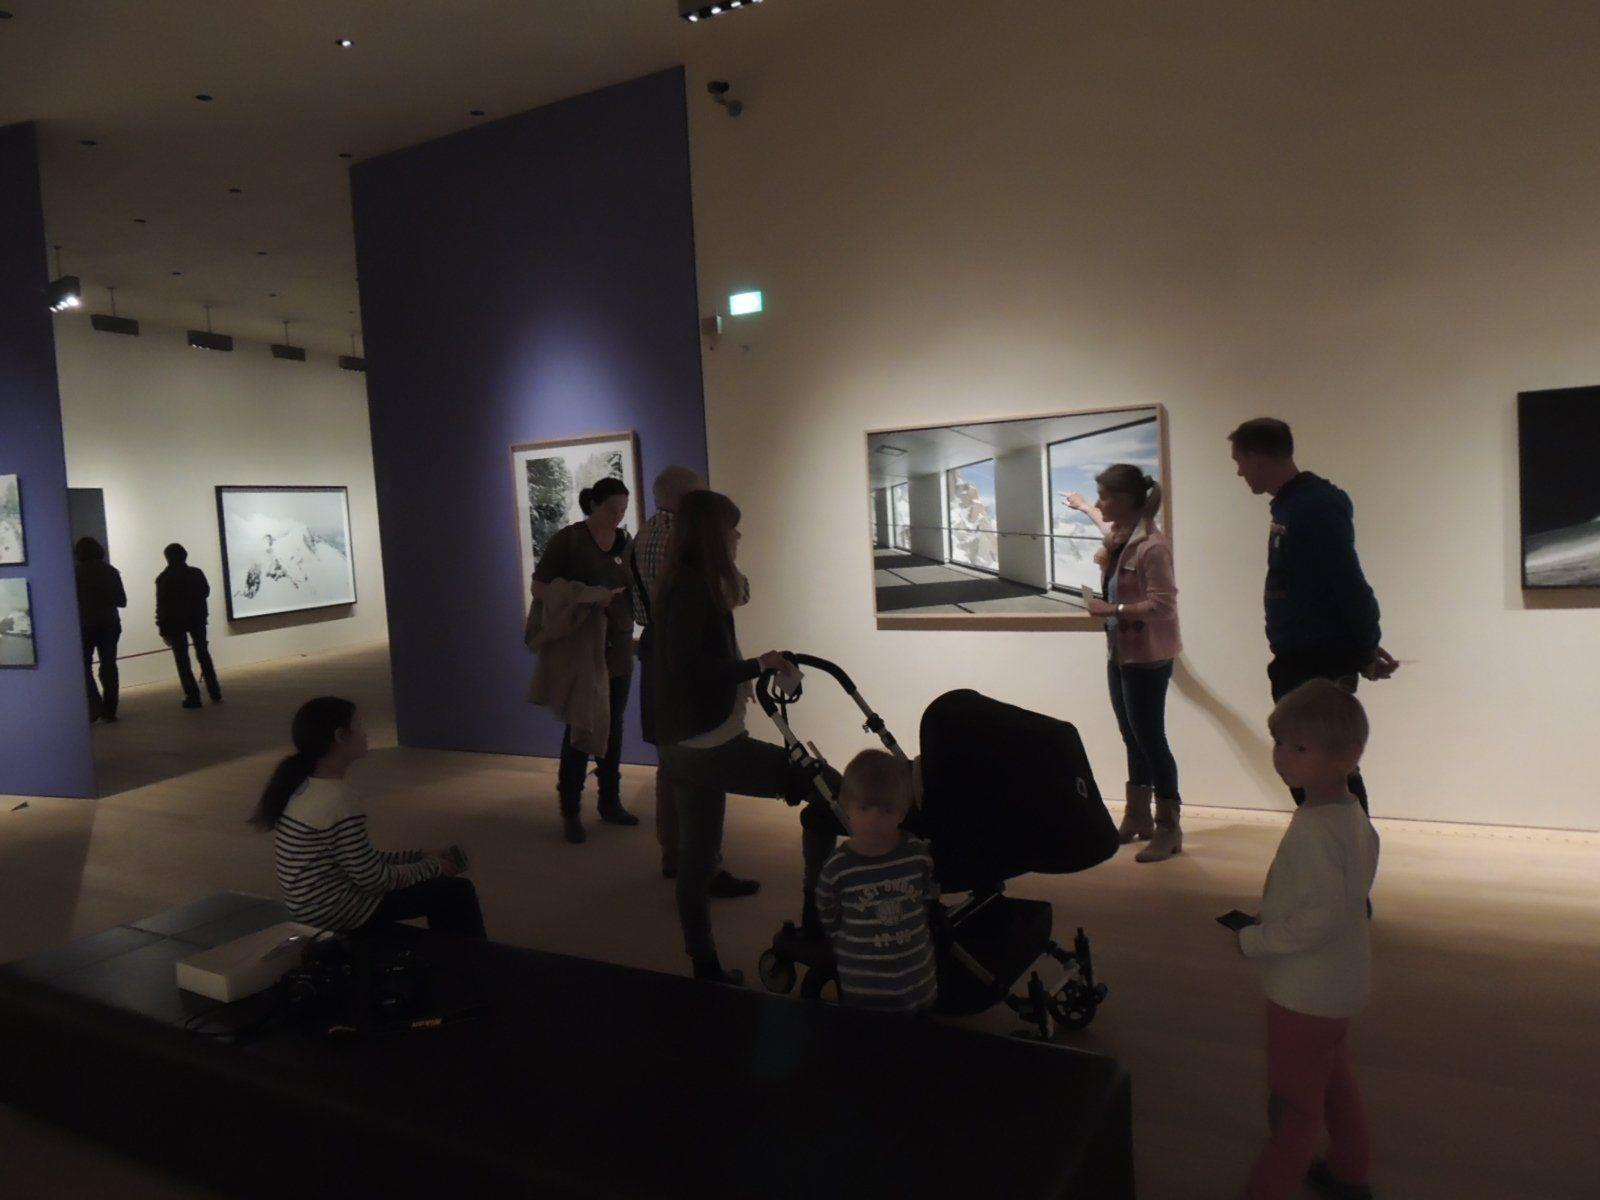 Familie auf Tour durchs Museum